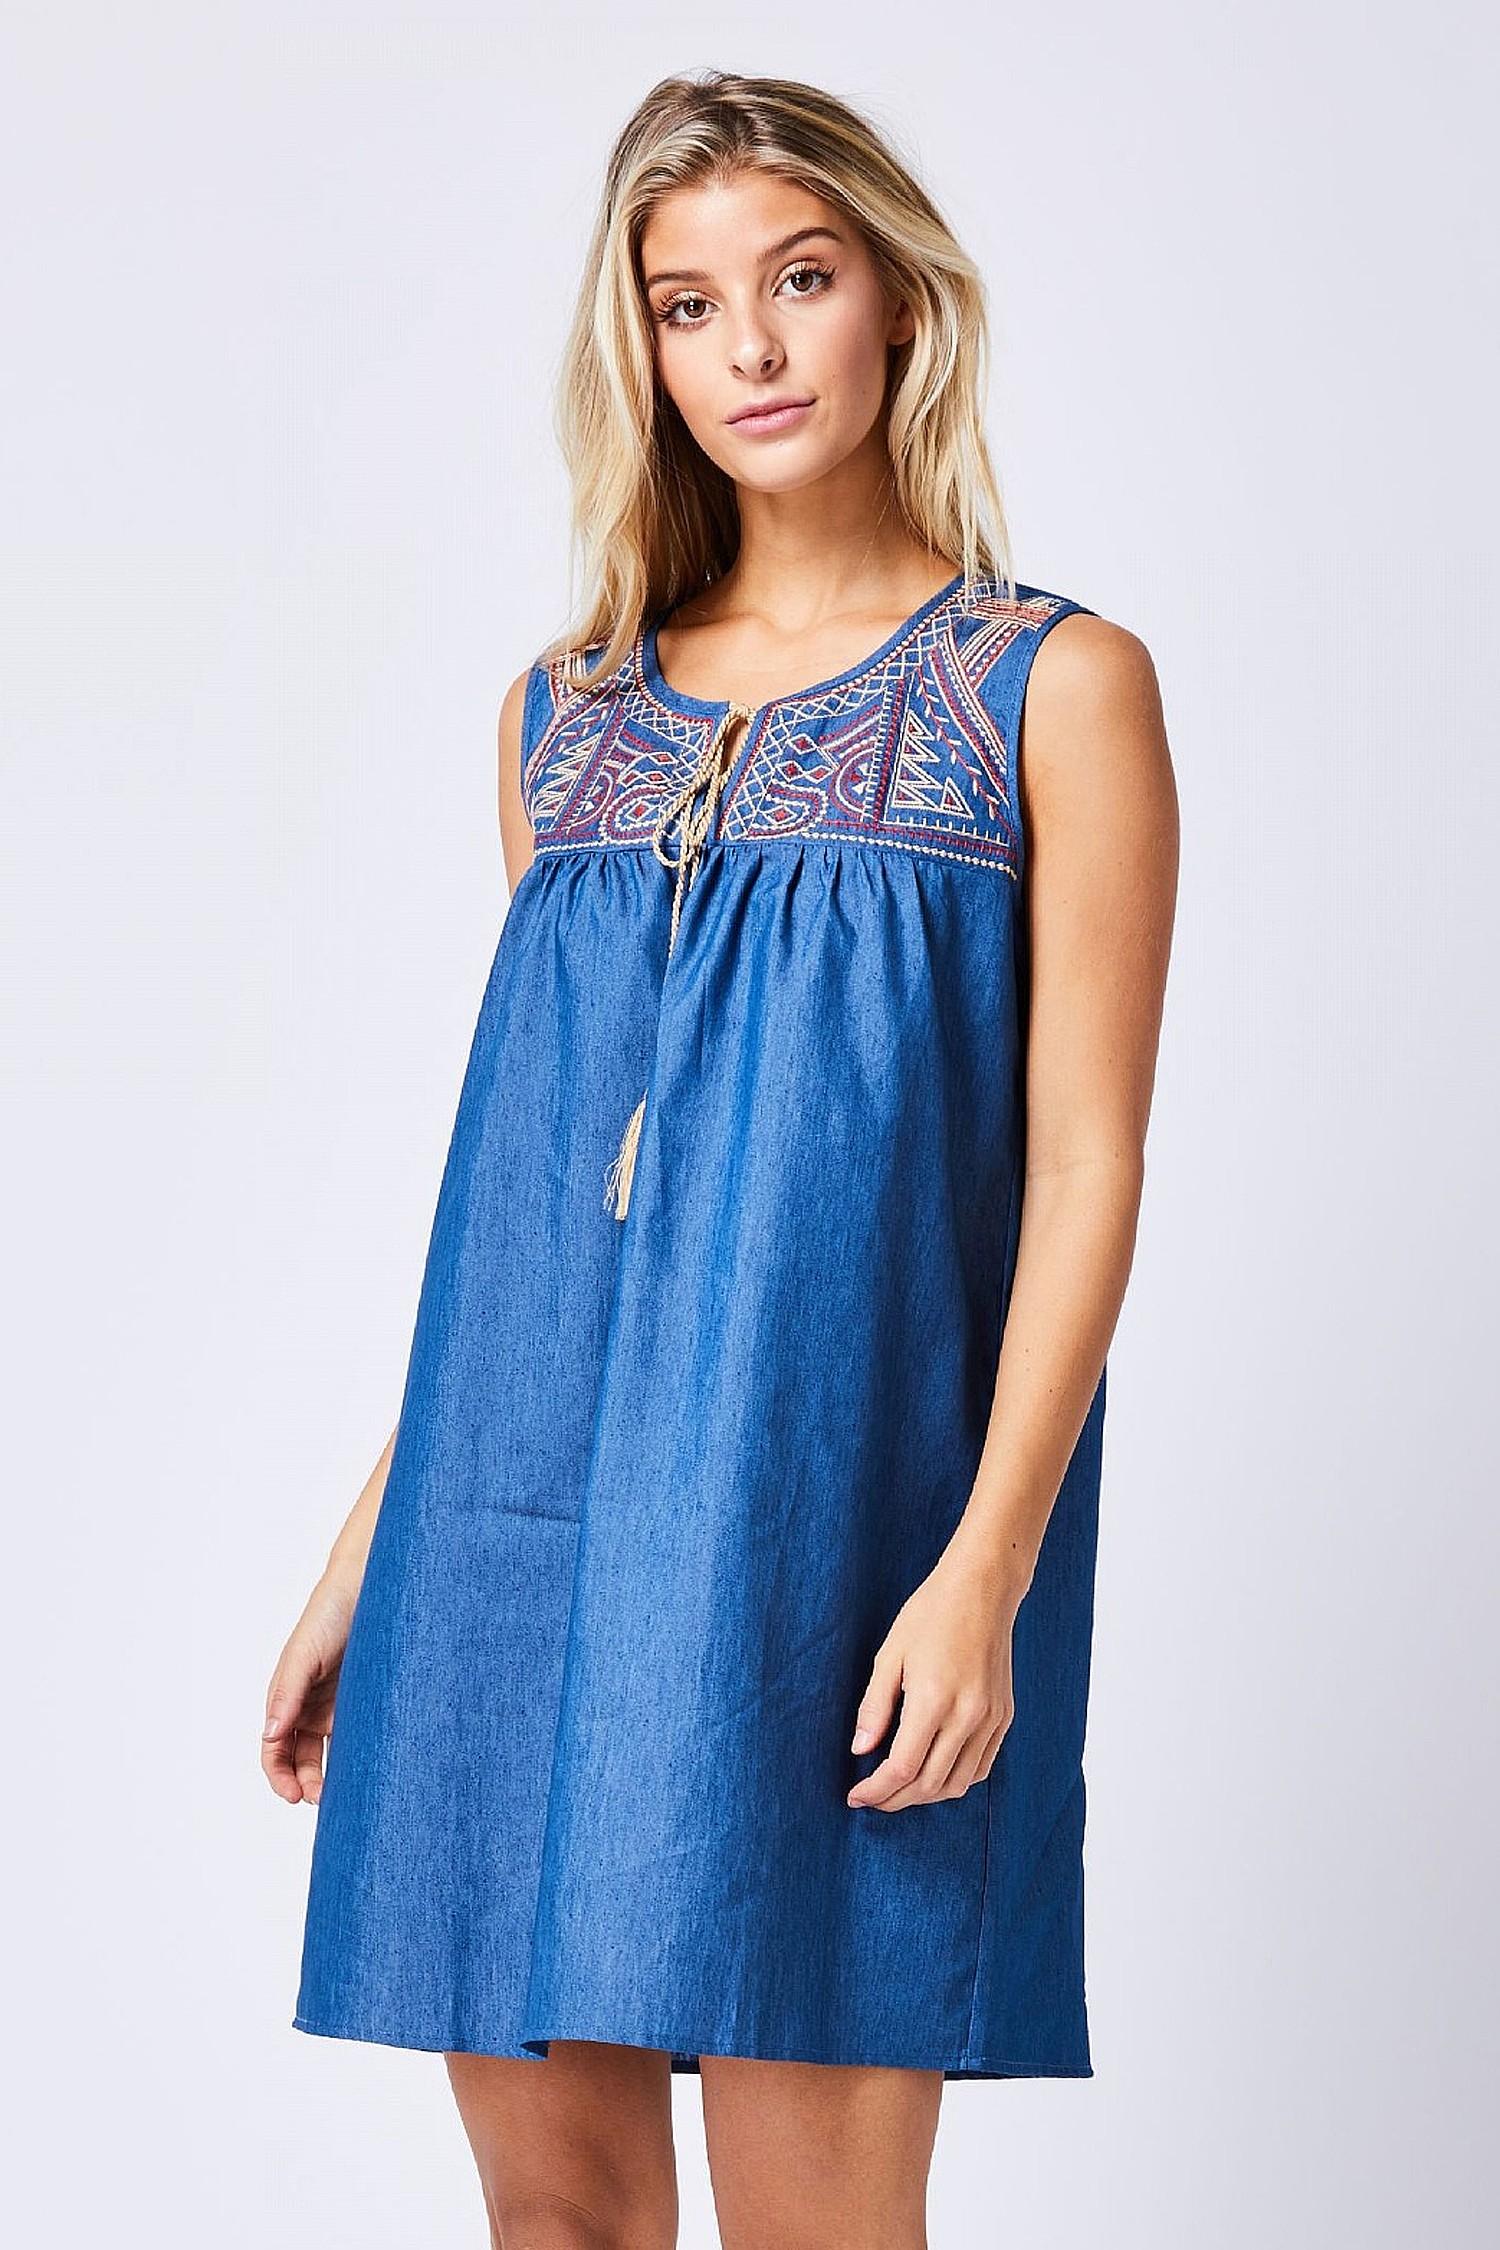 Blue Denim Sleeveless Mini Dress